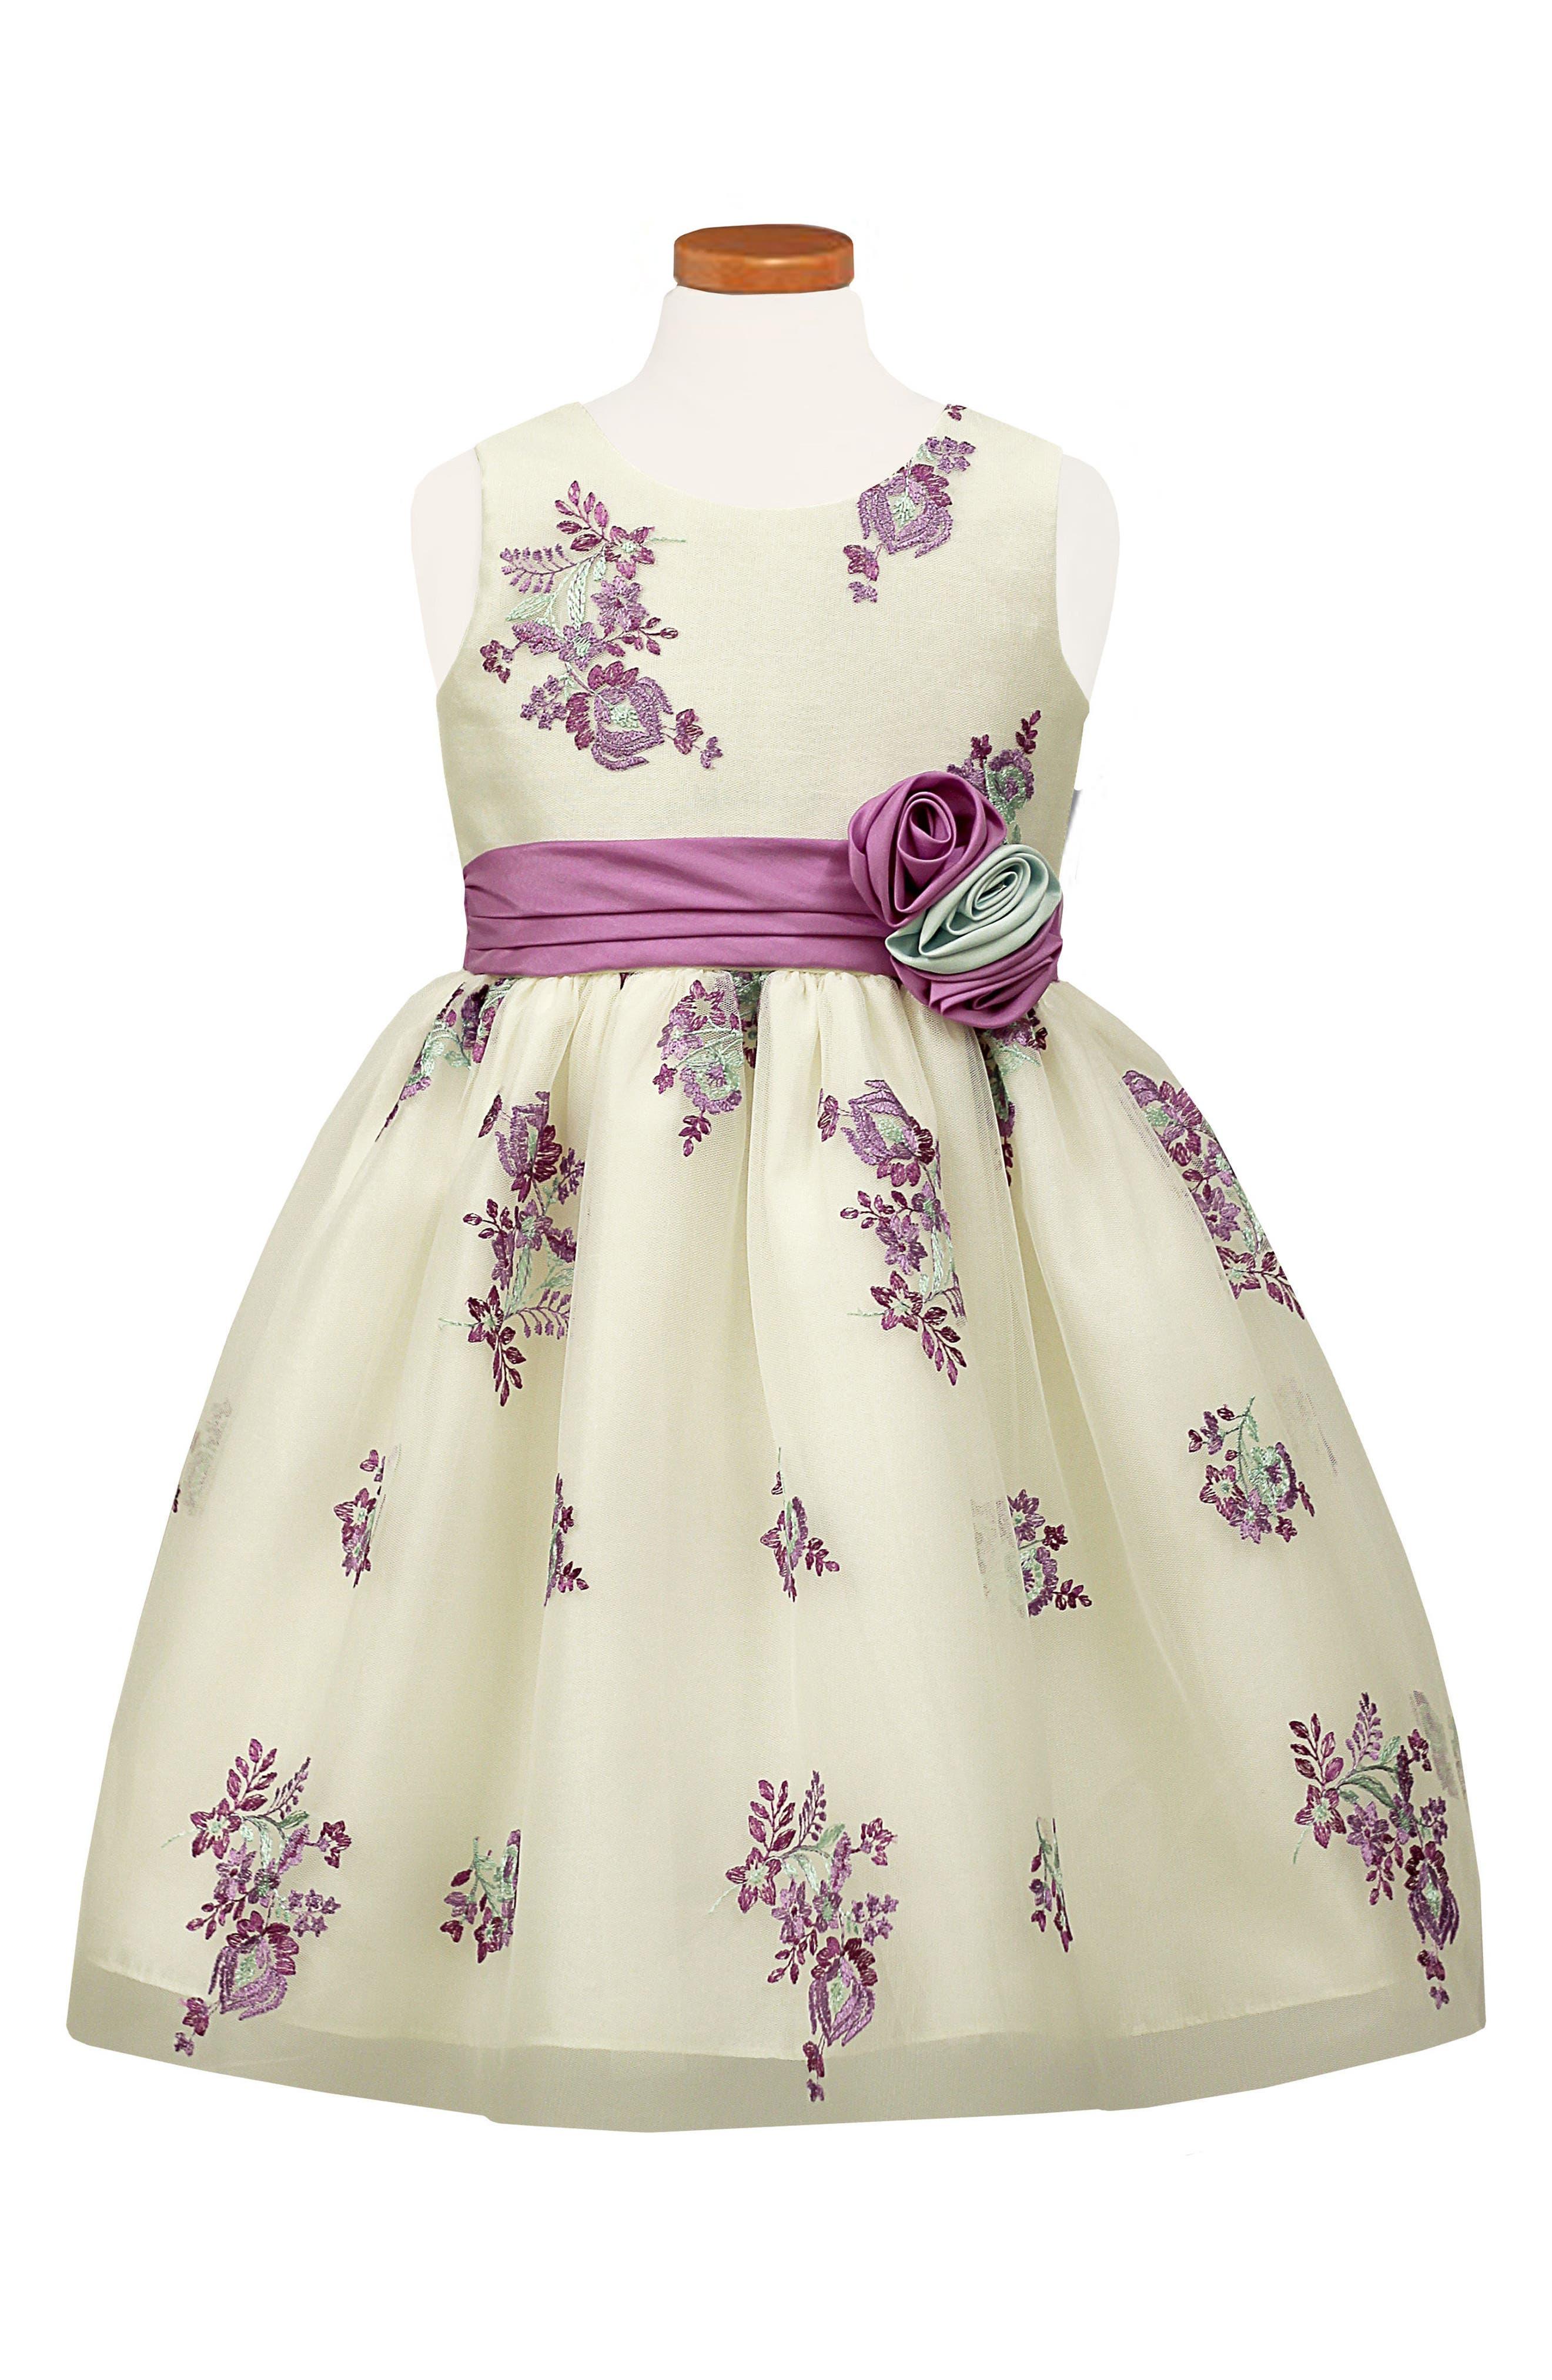 Main Image - Sorbet Embroidered Floral Tulle Dress (Big Girls)